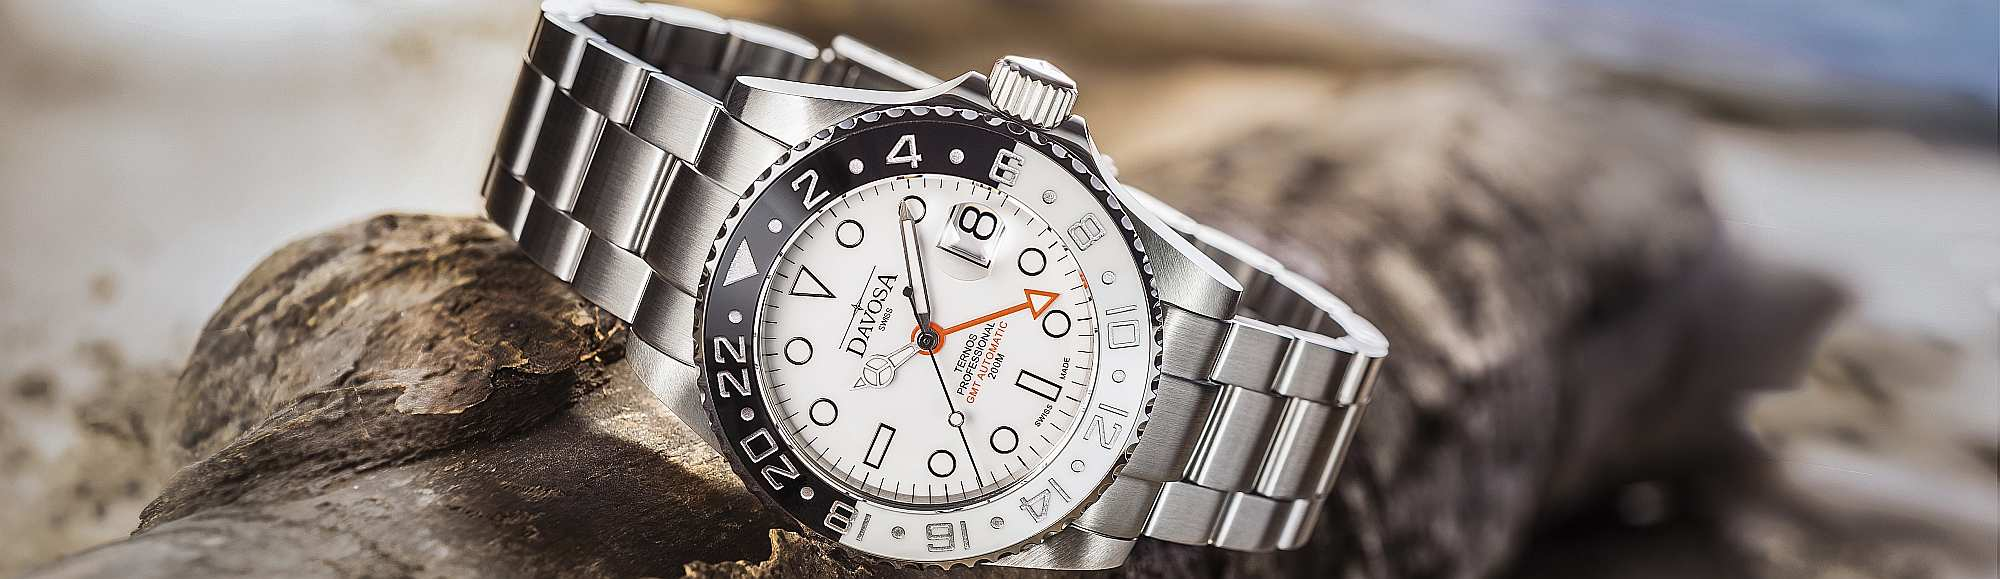 Davosa-Armbanduhren